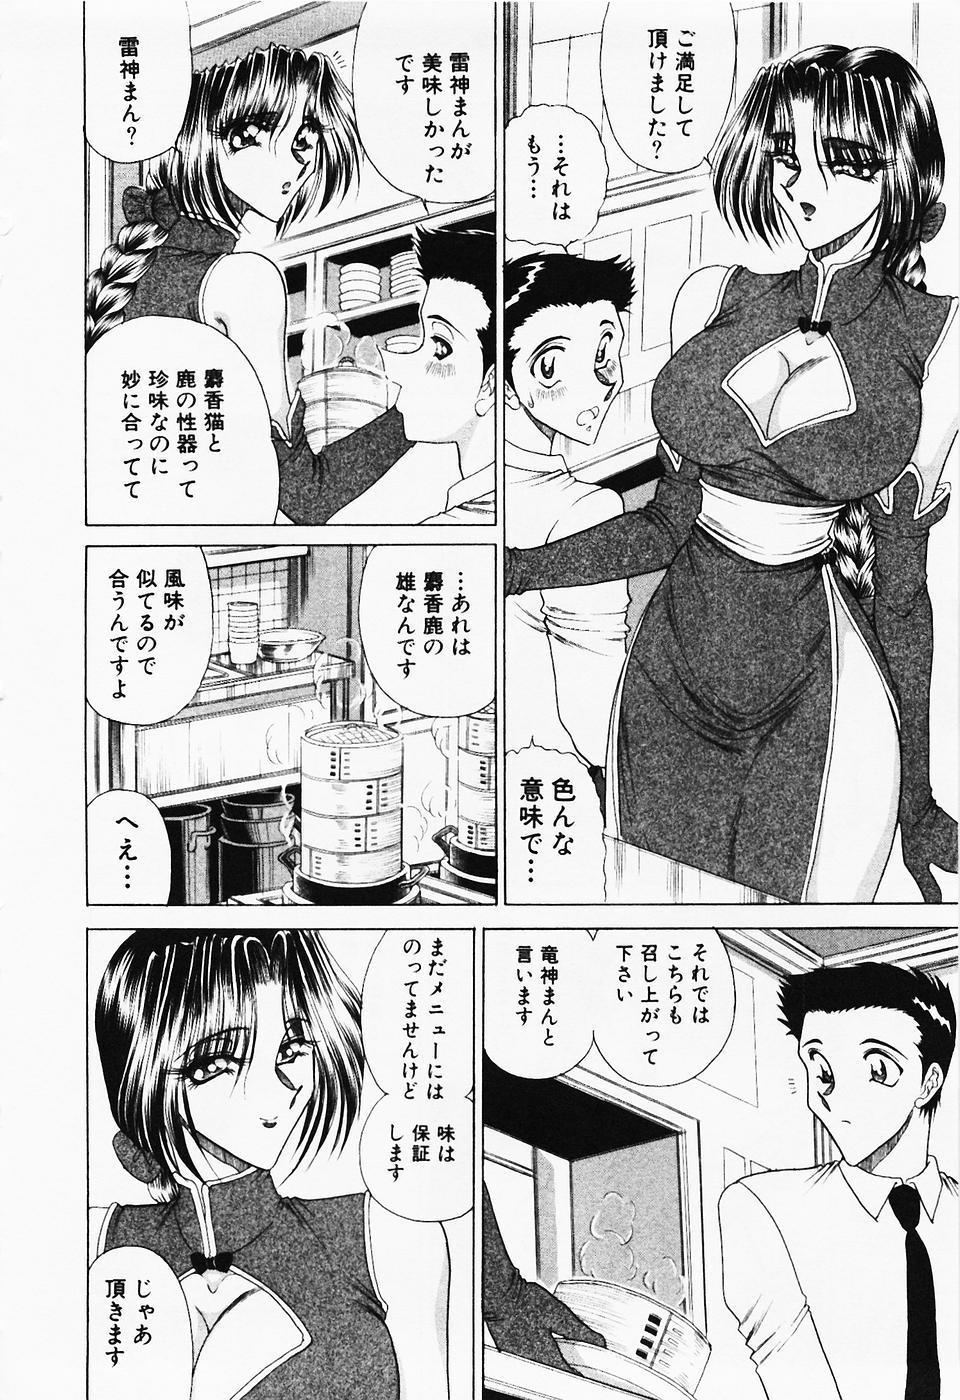 Seifuku Zanmai 134